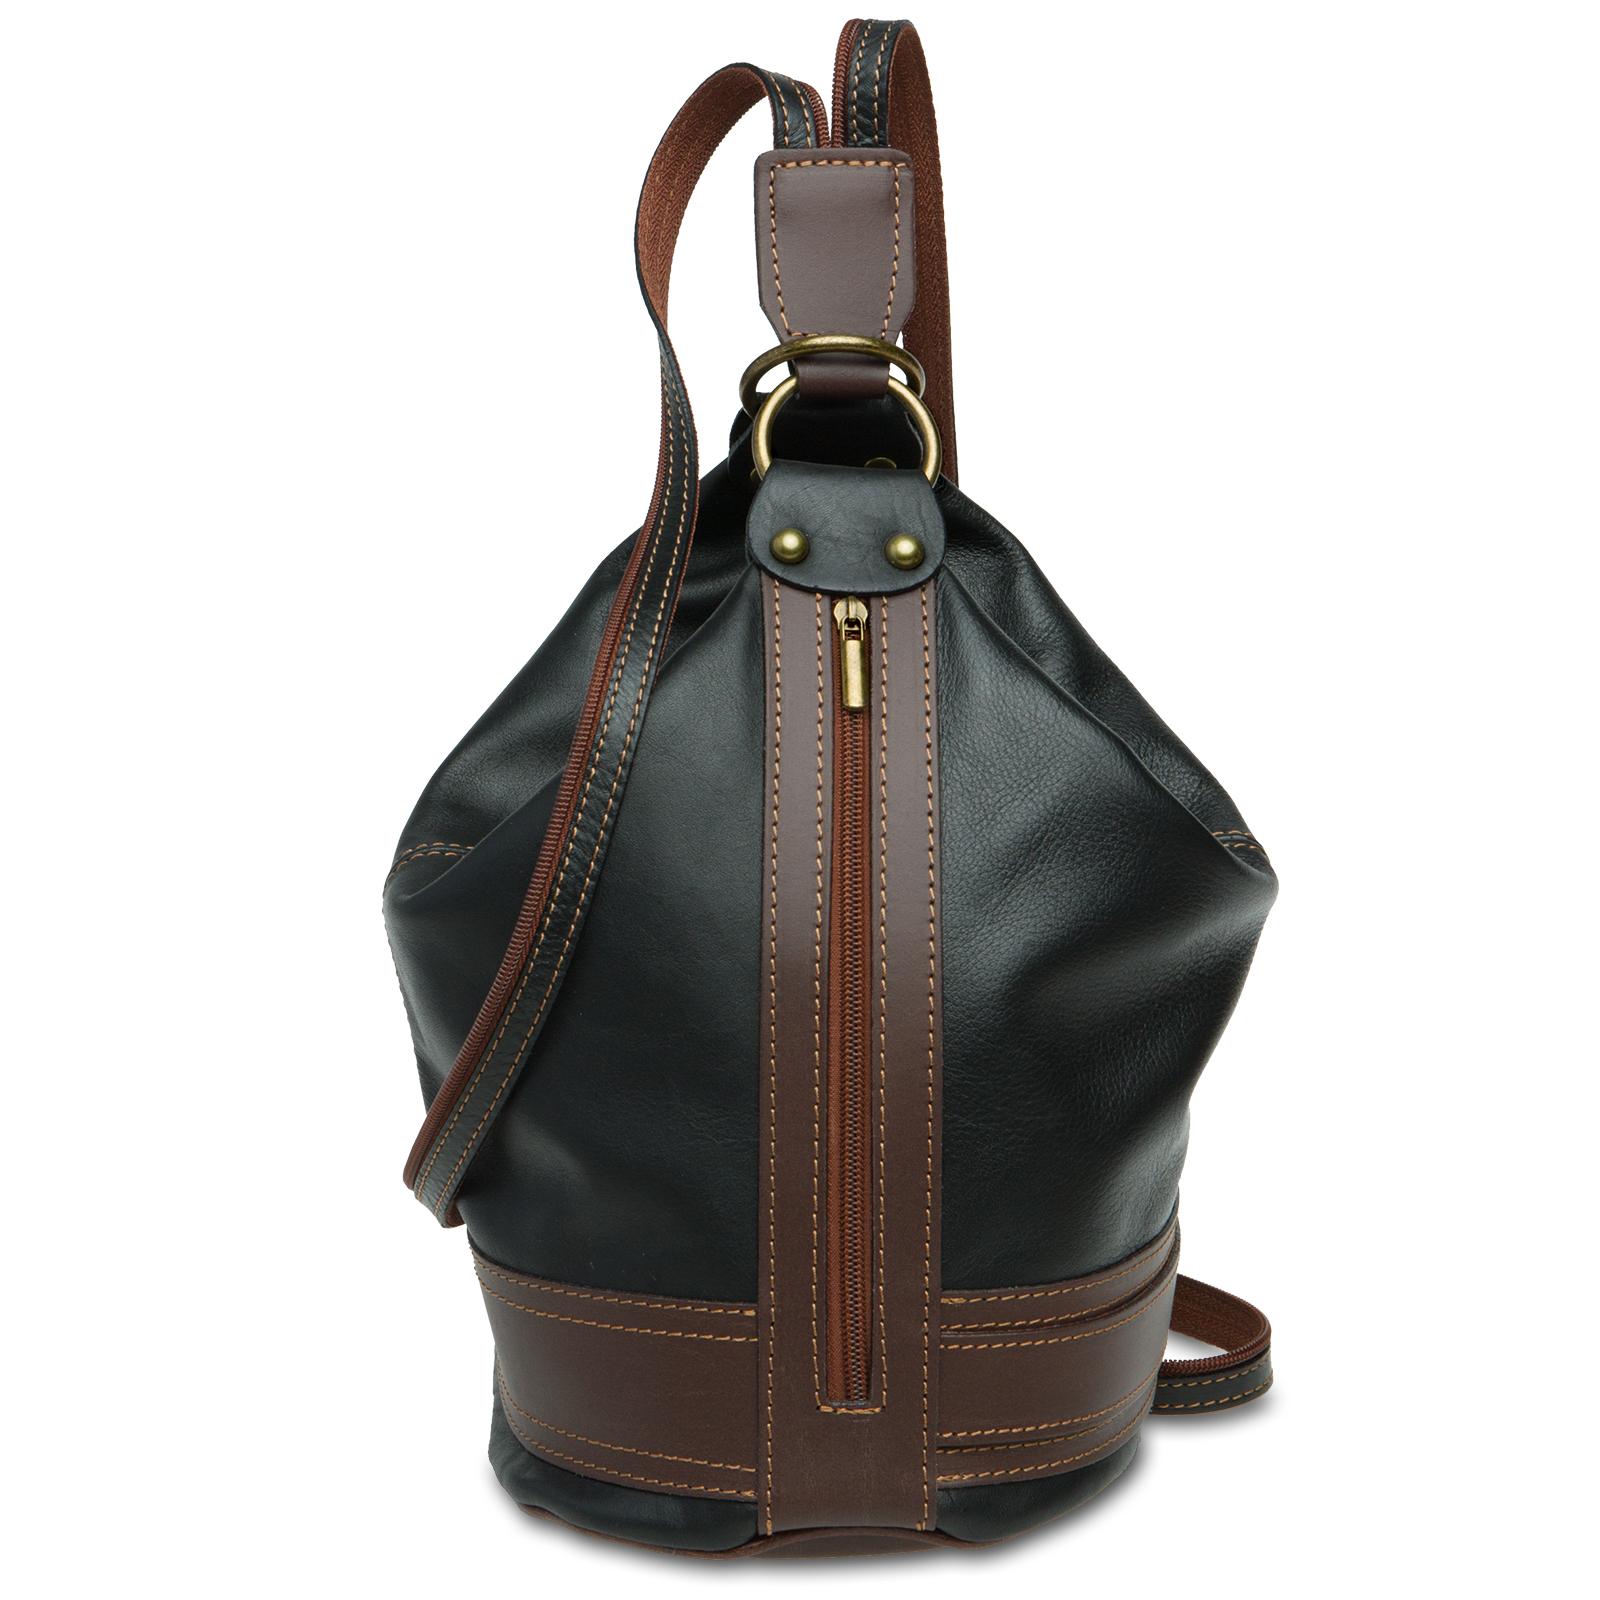 caspar tl721 2 in 1 rucksack handtasche schultertasche. Black Bedroom Furniture Sets. Home Design Ideas